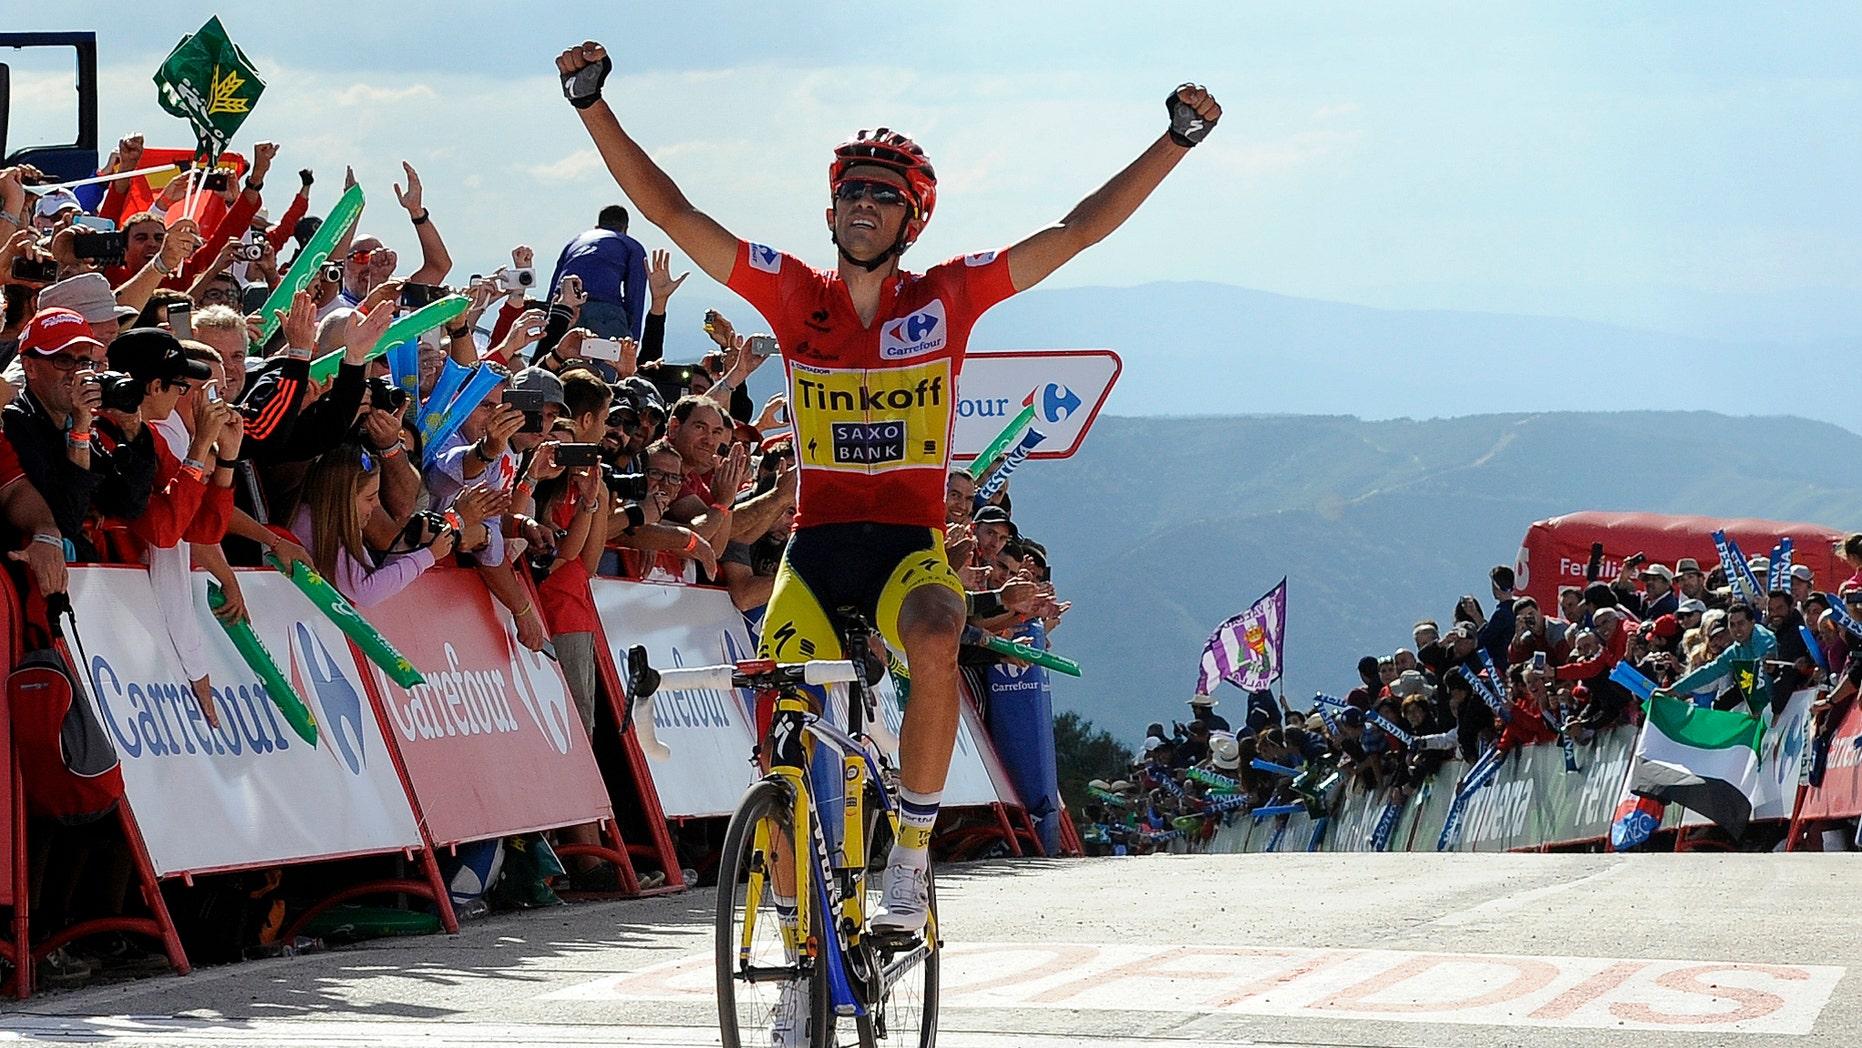 Alberto Contador of Spain wins the 20th stage of the Spanish Vuelta cycling, a 185.7-kilometer (115-mile) ride between Santo Estevo De Ribas De Sil and Puerto De Ancares, Spain, Saturday, Sept. 13, 2014. Contador won the 20th stage of the Spanish Vuelta Saturday and consolidated his leadership. The 21-stage race ends tomorrow, Sept. 14, in Santiago de Compostela. (AP Photo/Paulo Duarte)